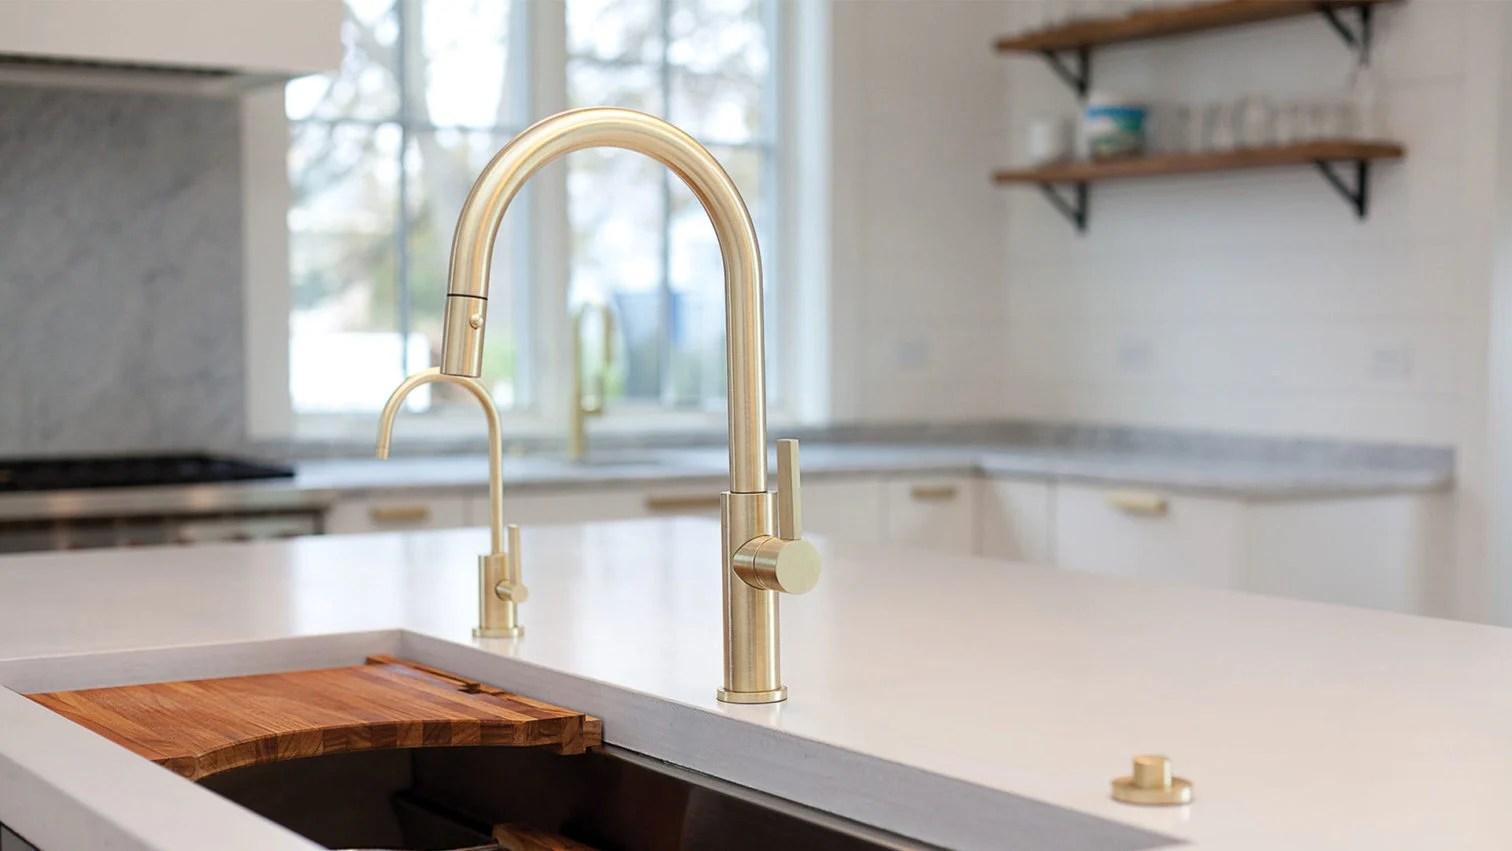 corsano series kitchen faucet